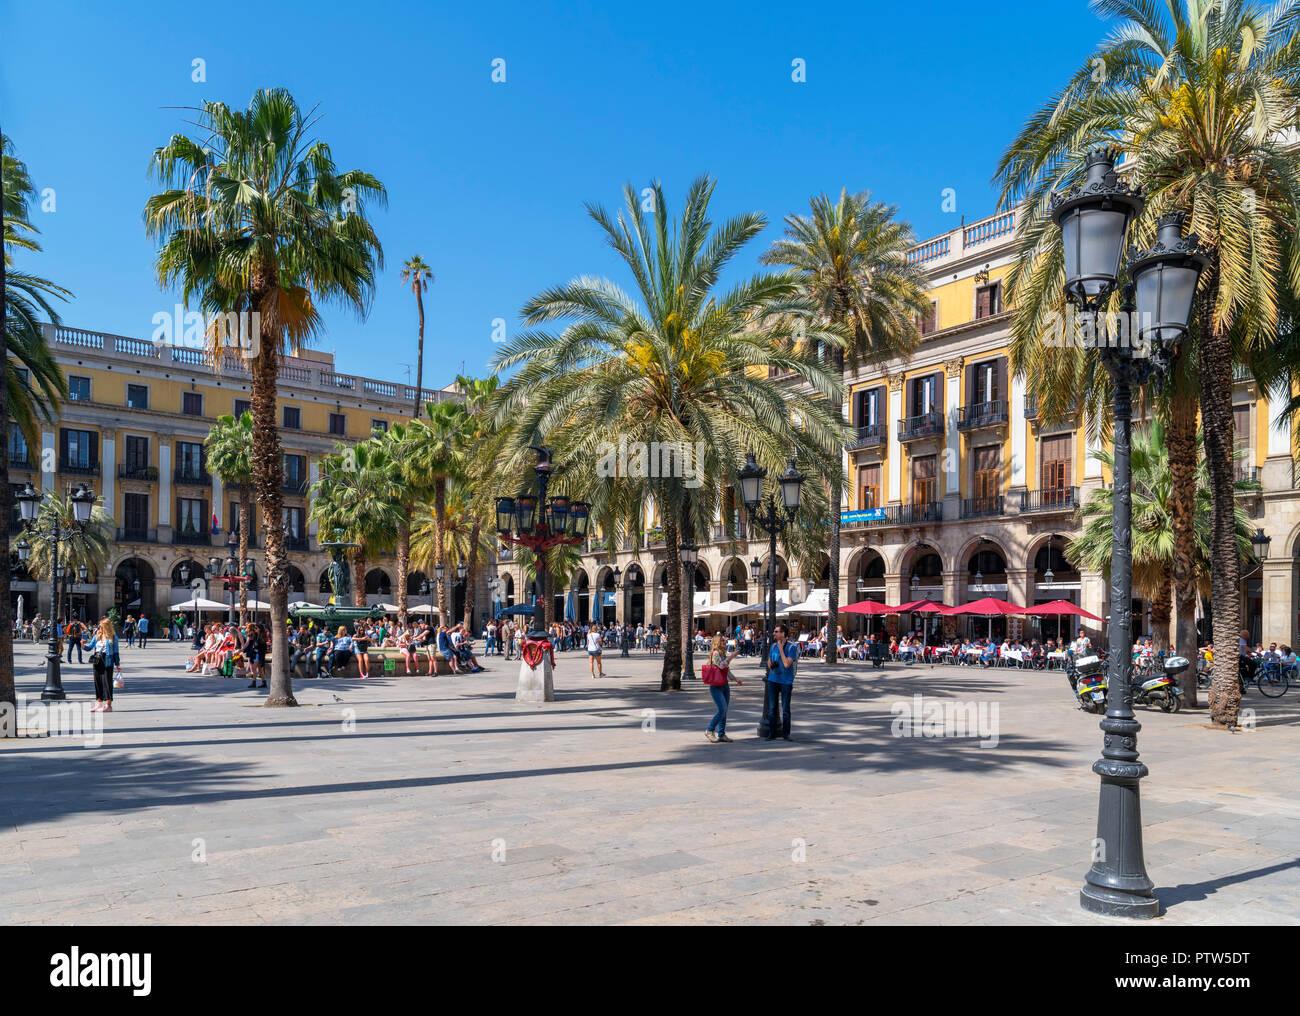 Plaça Reial, Barcelona. Cafes, bars and restaurants on the Plaça Reial (Plaza Real), Barri Gotic, Barcelona, Catalunya, Spain. - Stock Image